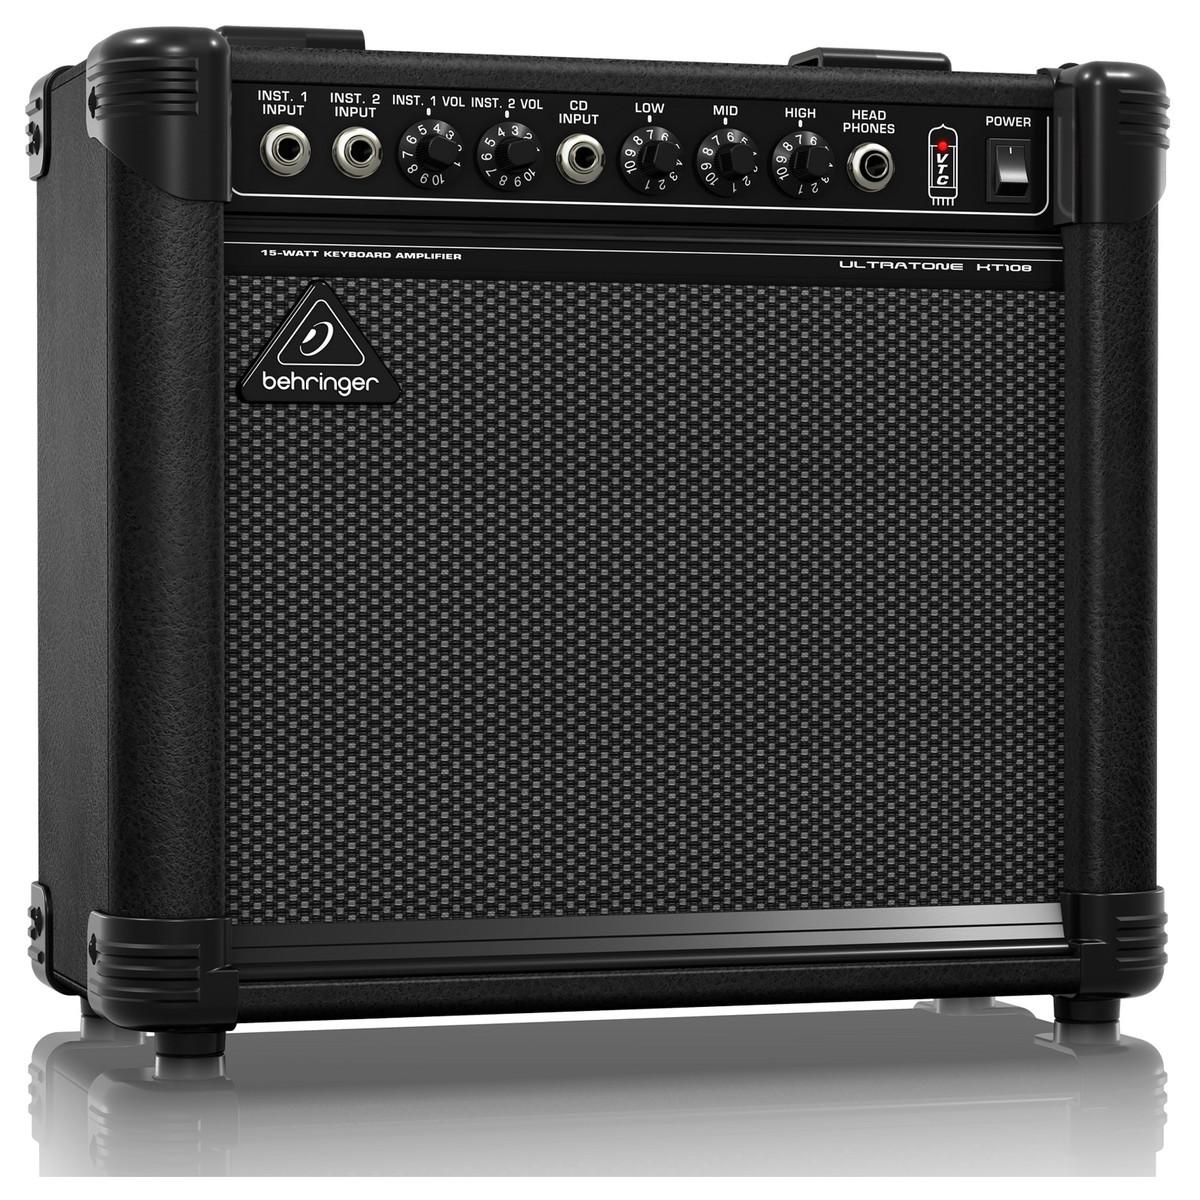 behringer kt108 ultra compact 15 watt keyboard amp at gear4music. Black Bedroom Furniture Sets. Home Design Ideas